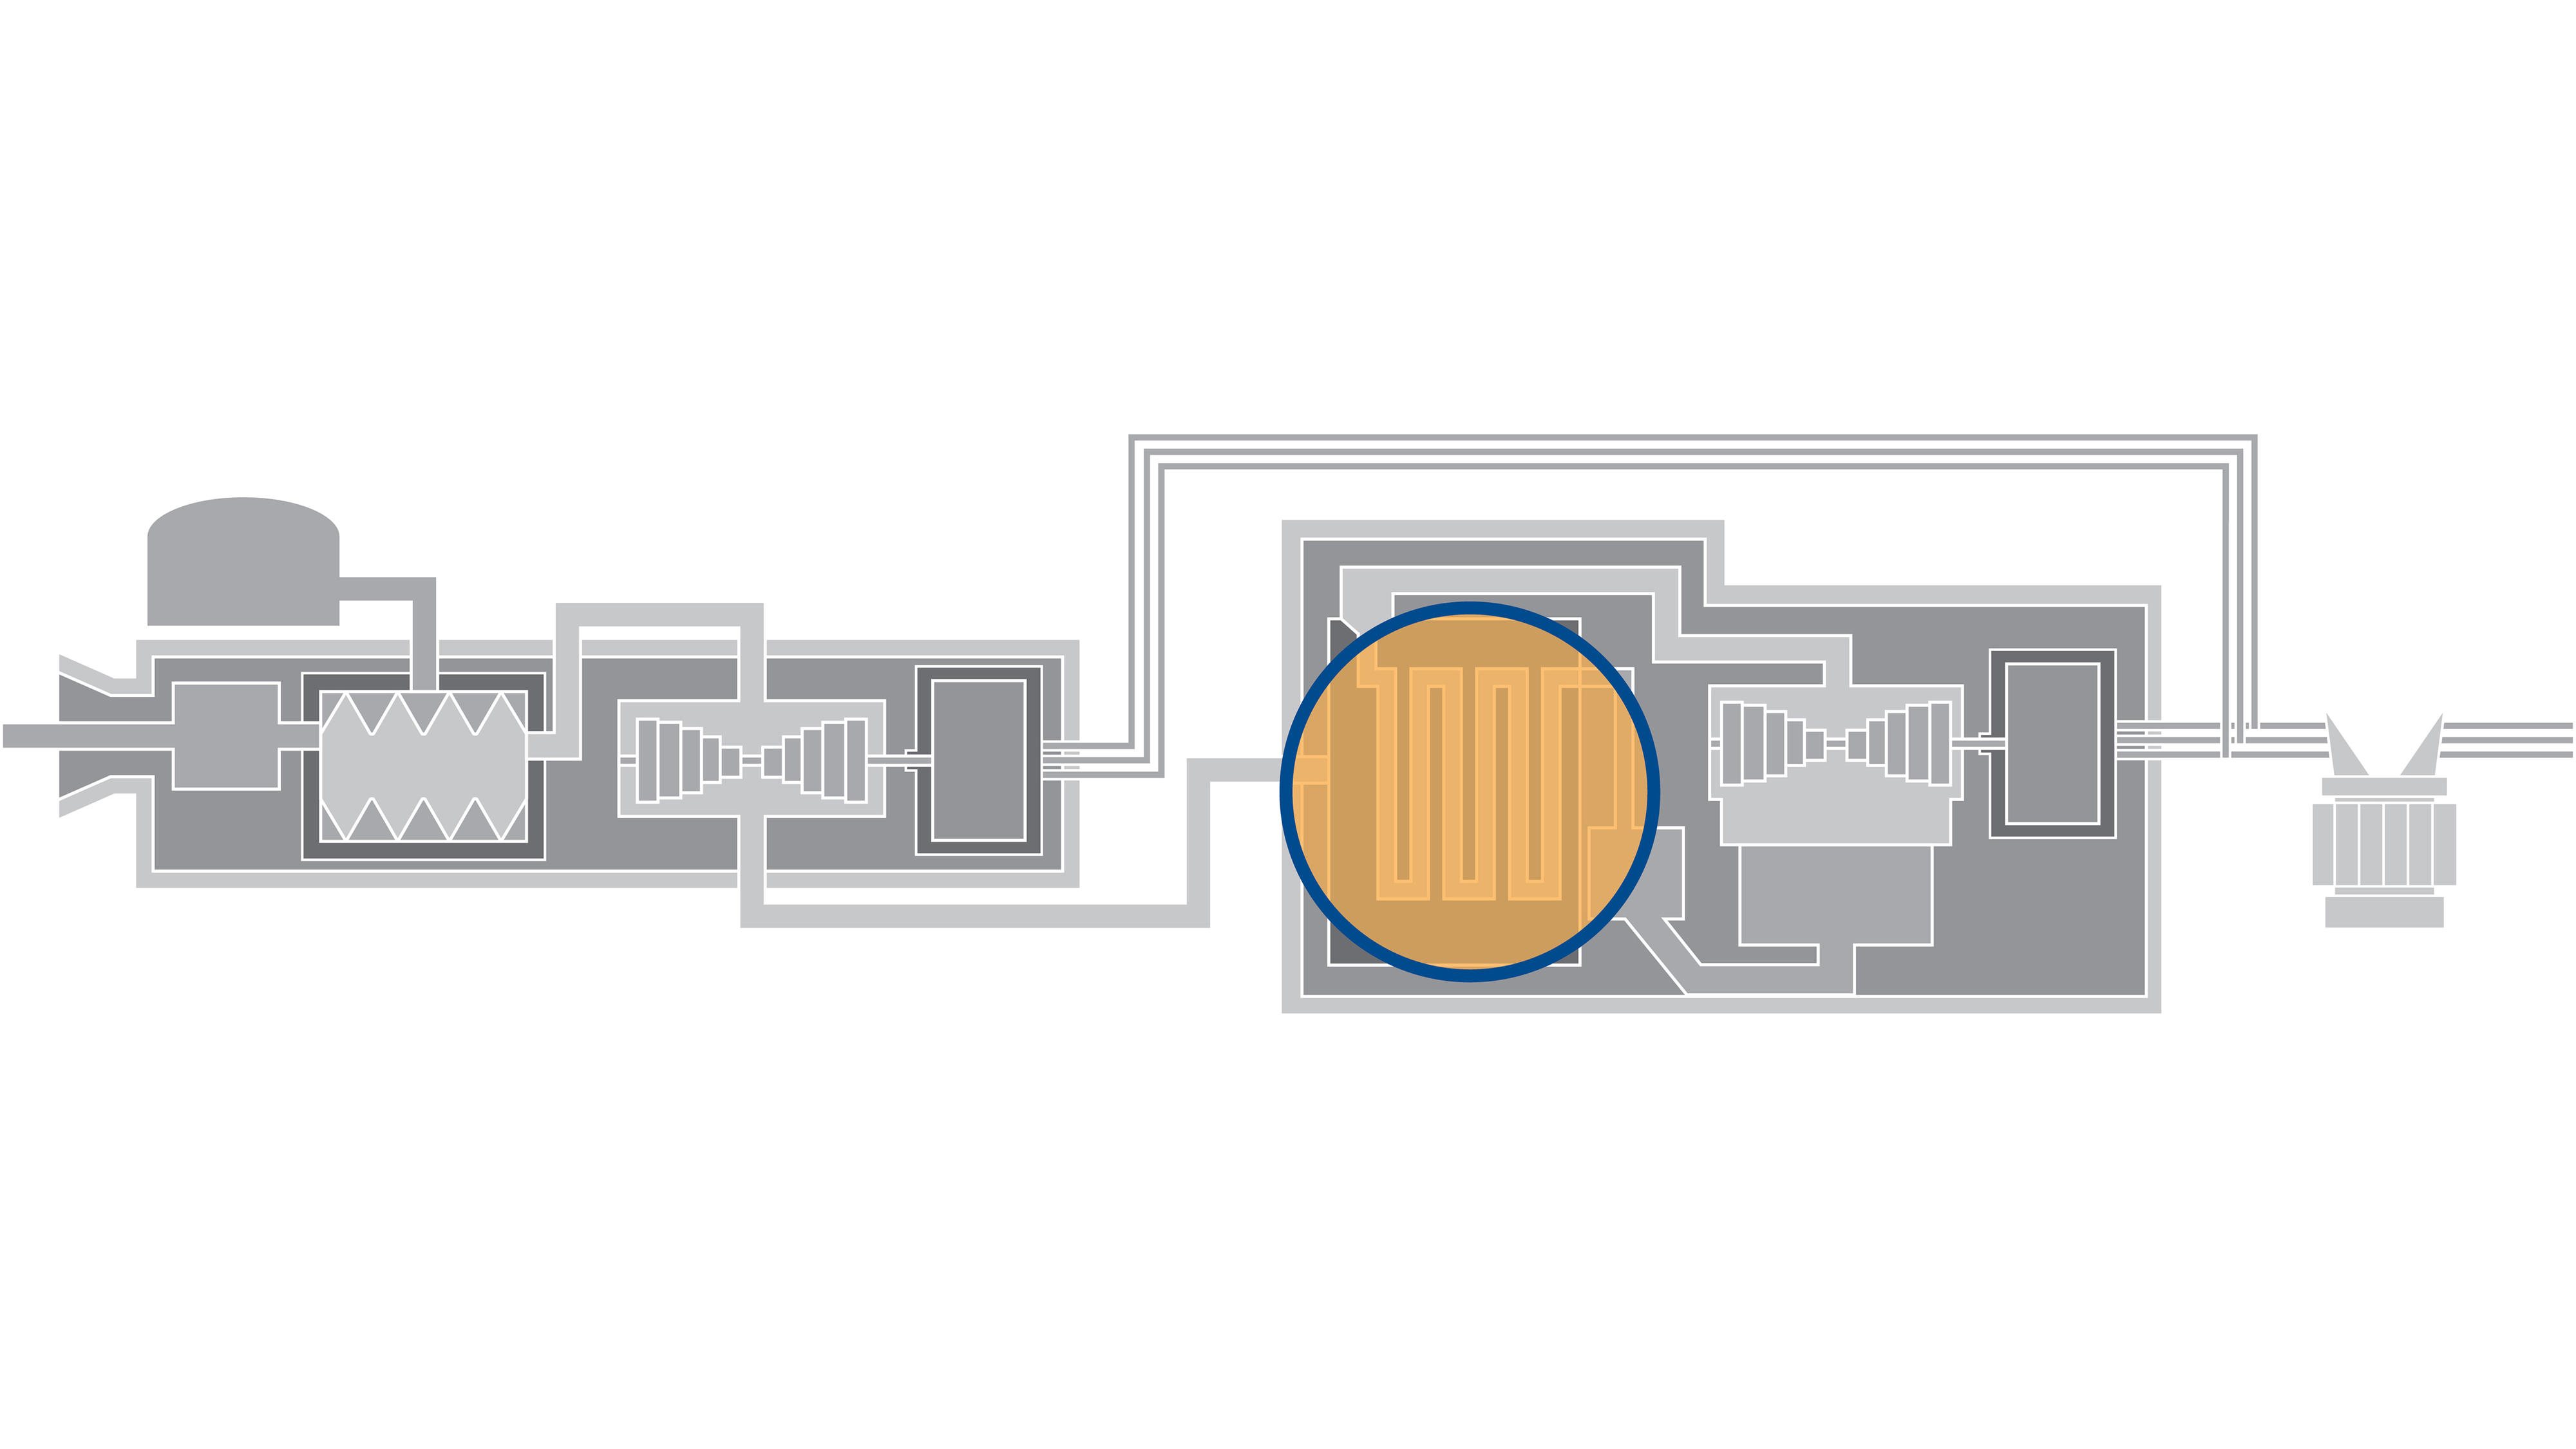 rosemount 3051 level transmitter manual